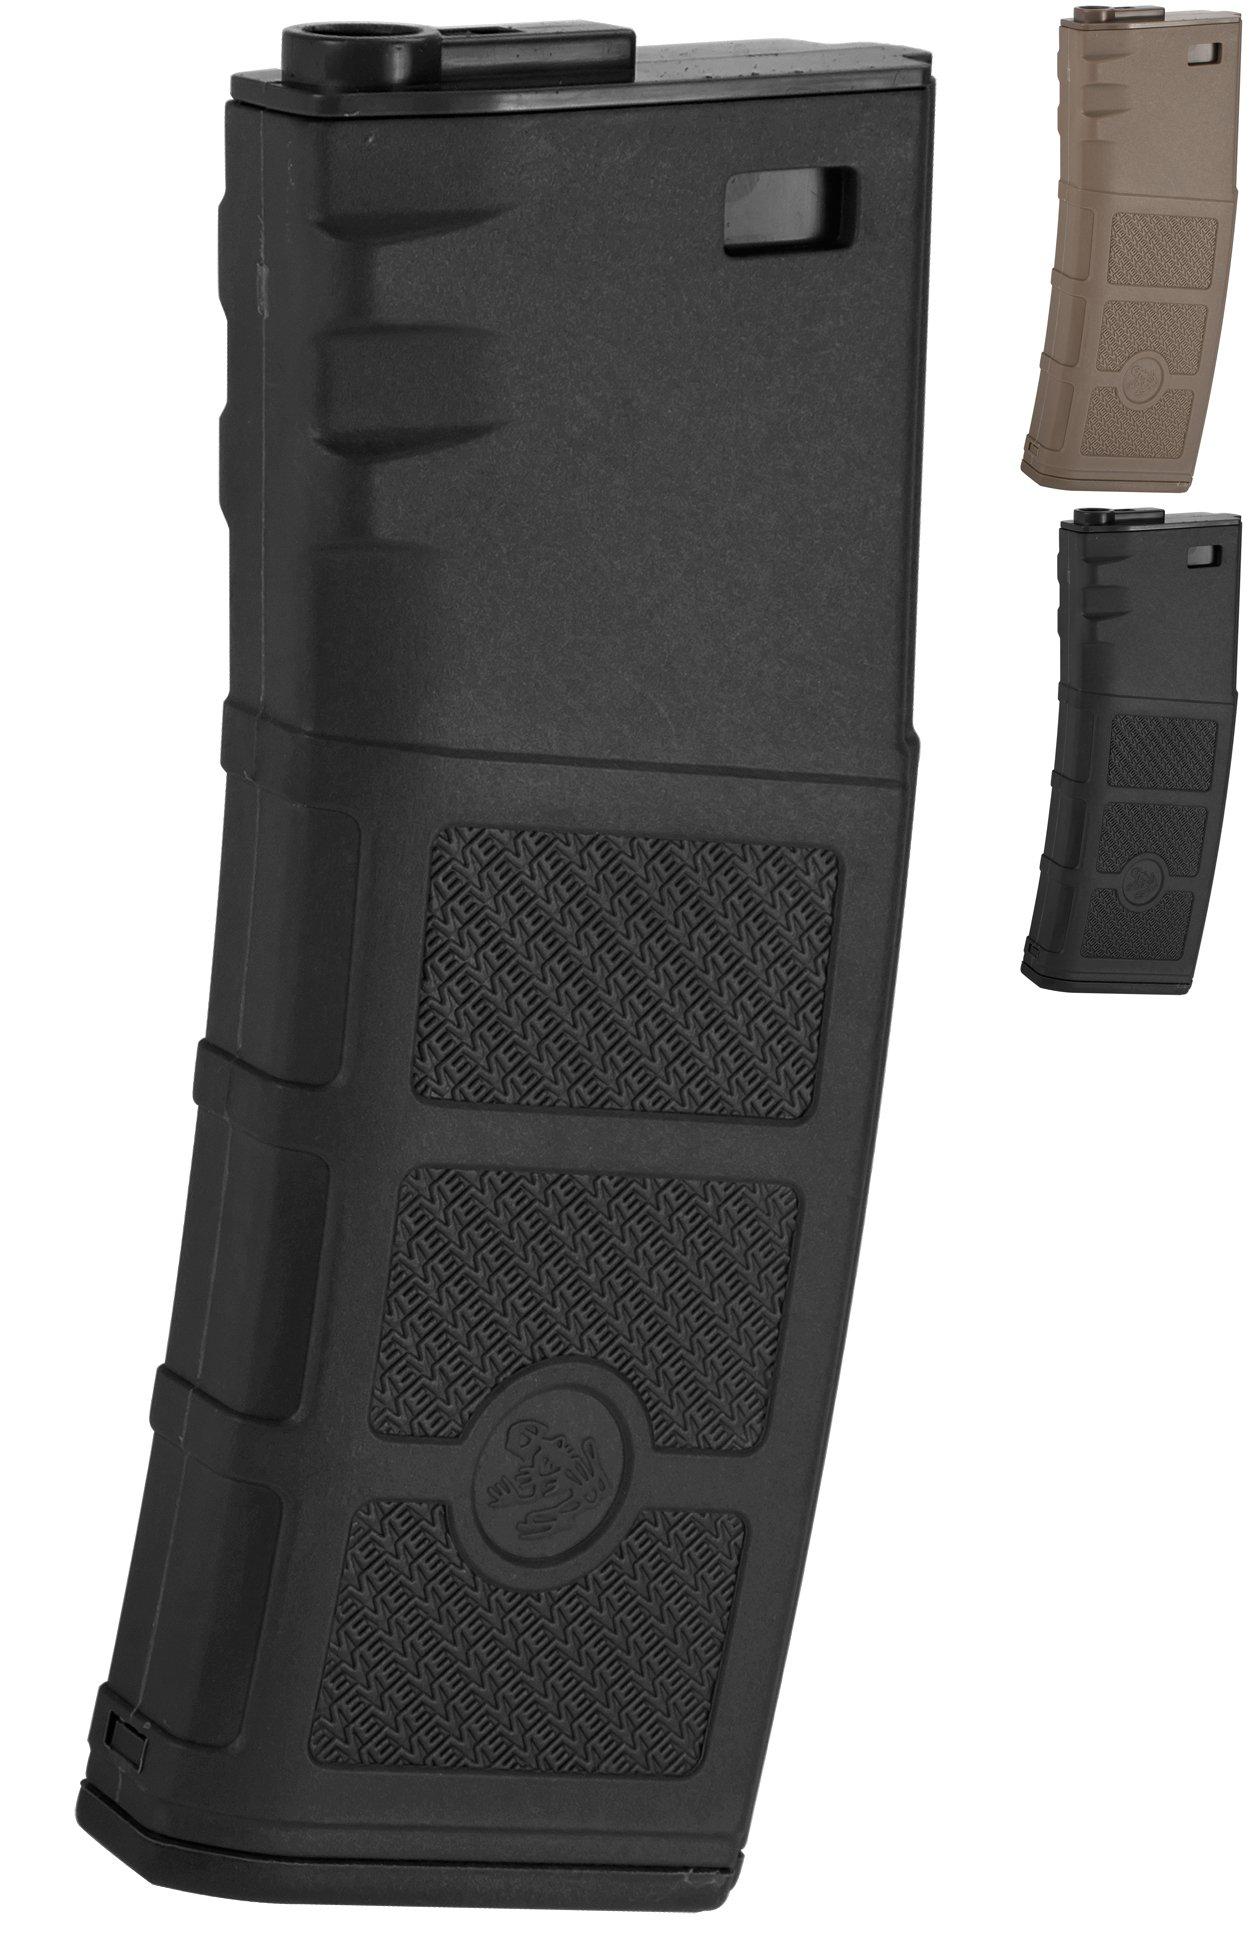 Evike G&P High RPS 130rd Polymer Mid-Cap Magazine for M4 M16 Airsoft AEG Rifles - Black - (42511) by Evike